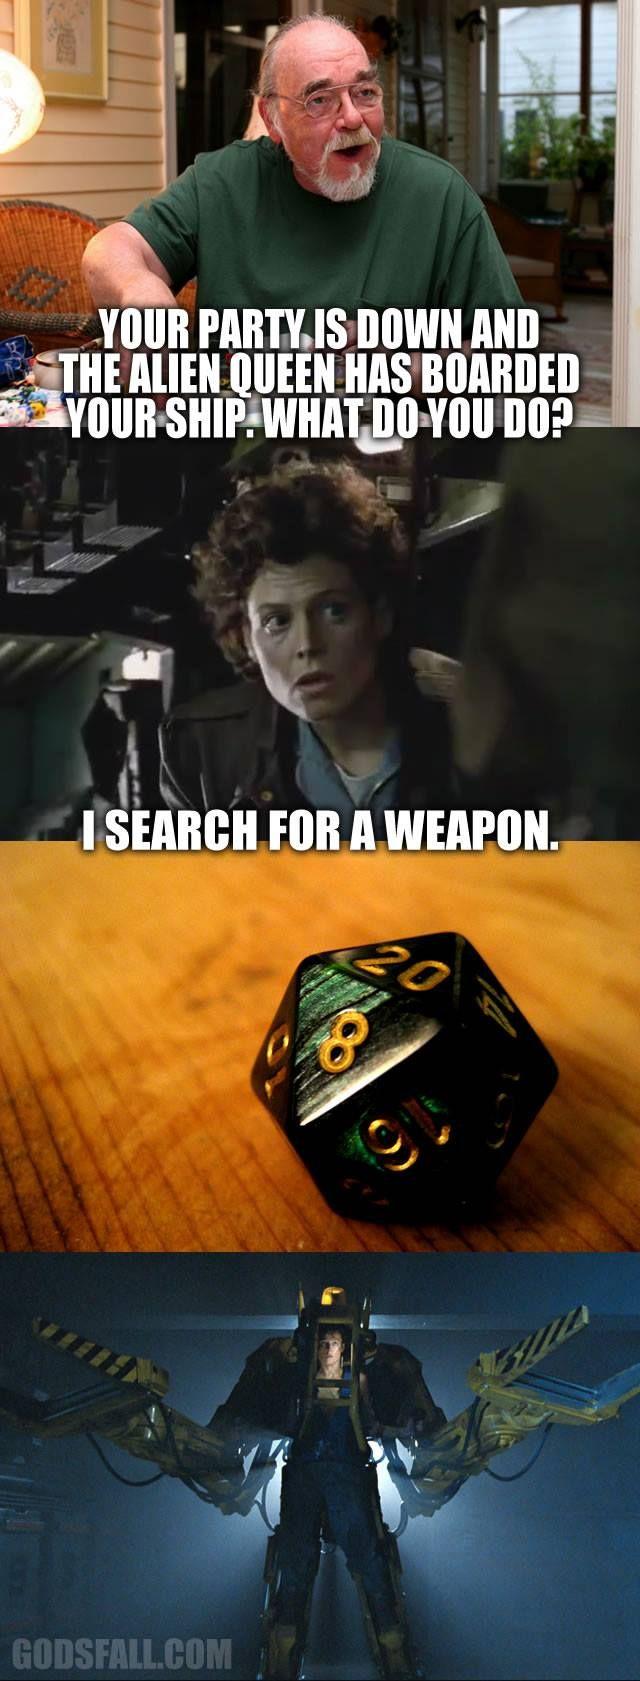 http://www.godsfall.com/that-gygax-meme/